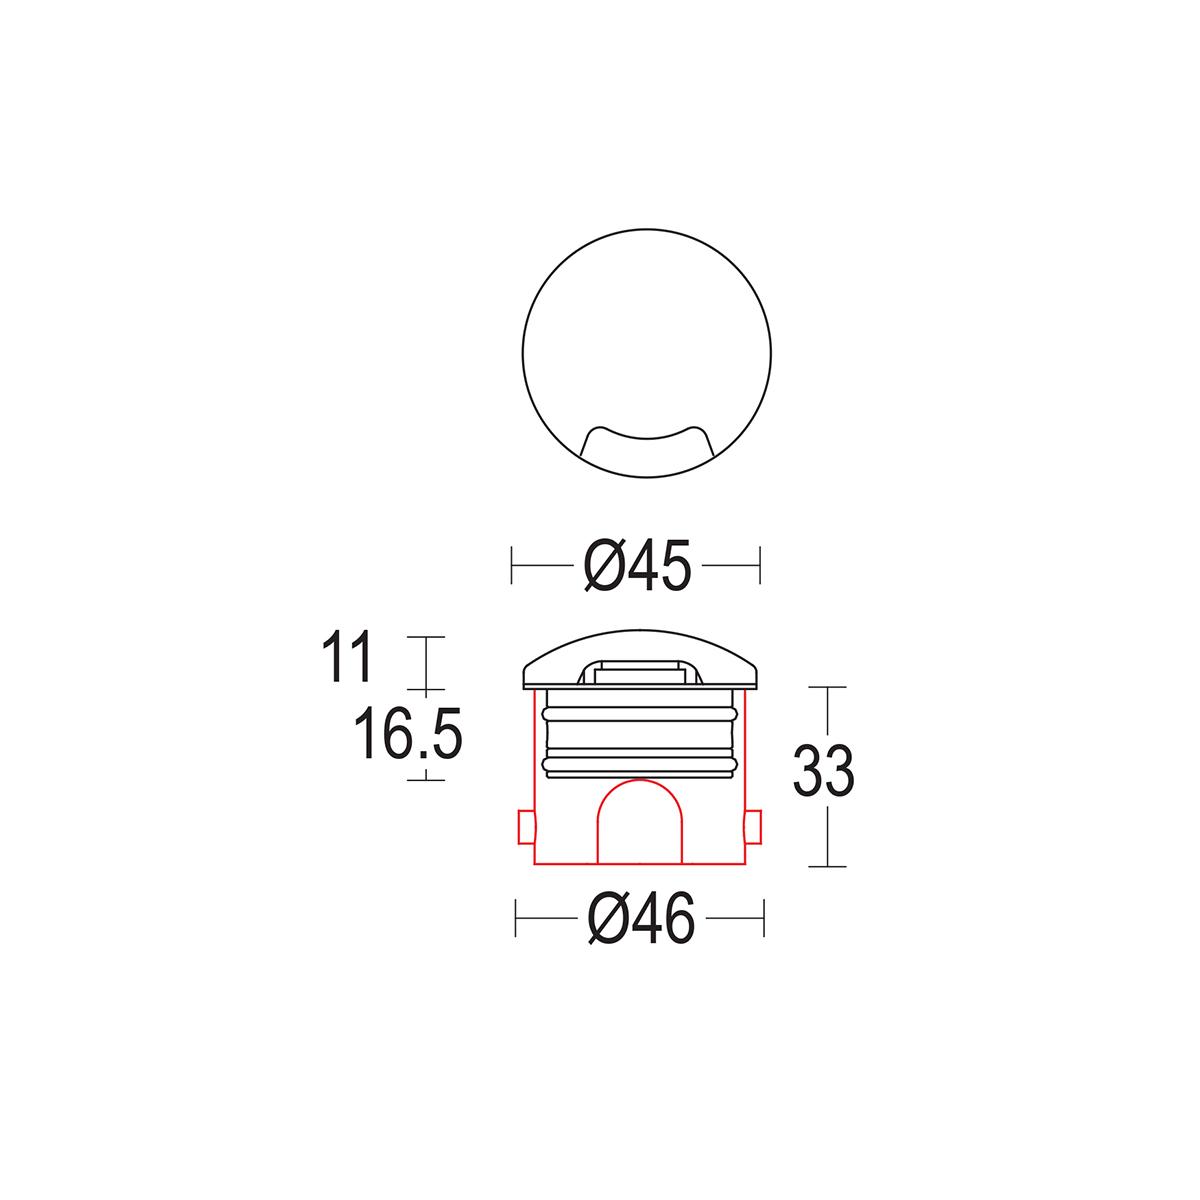 чертеж Segno walk 45 Ghidini уличный светильник GH1379.BAXO300EL